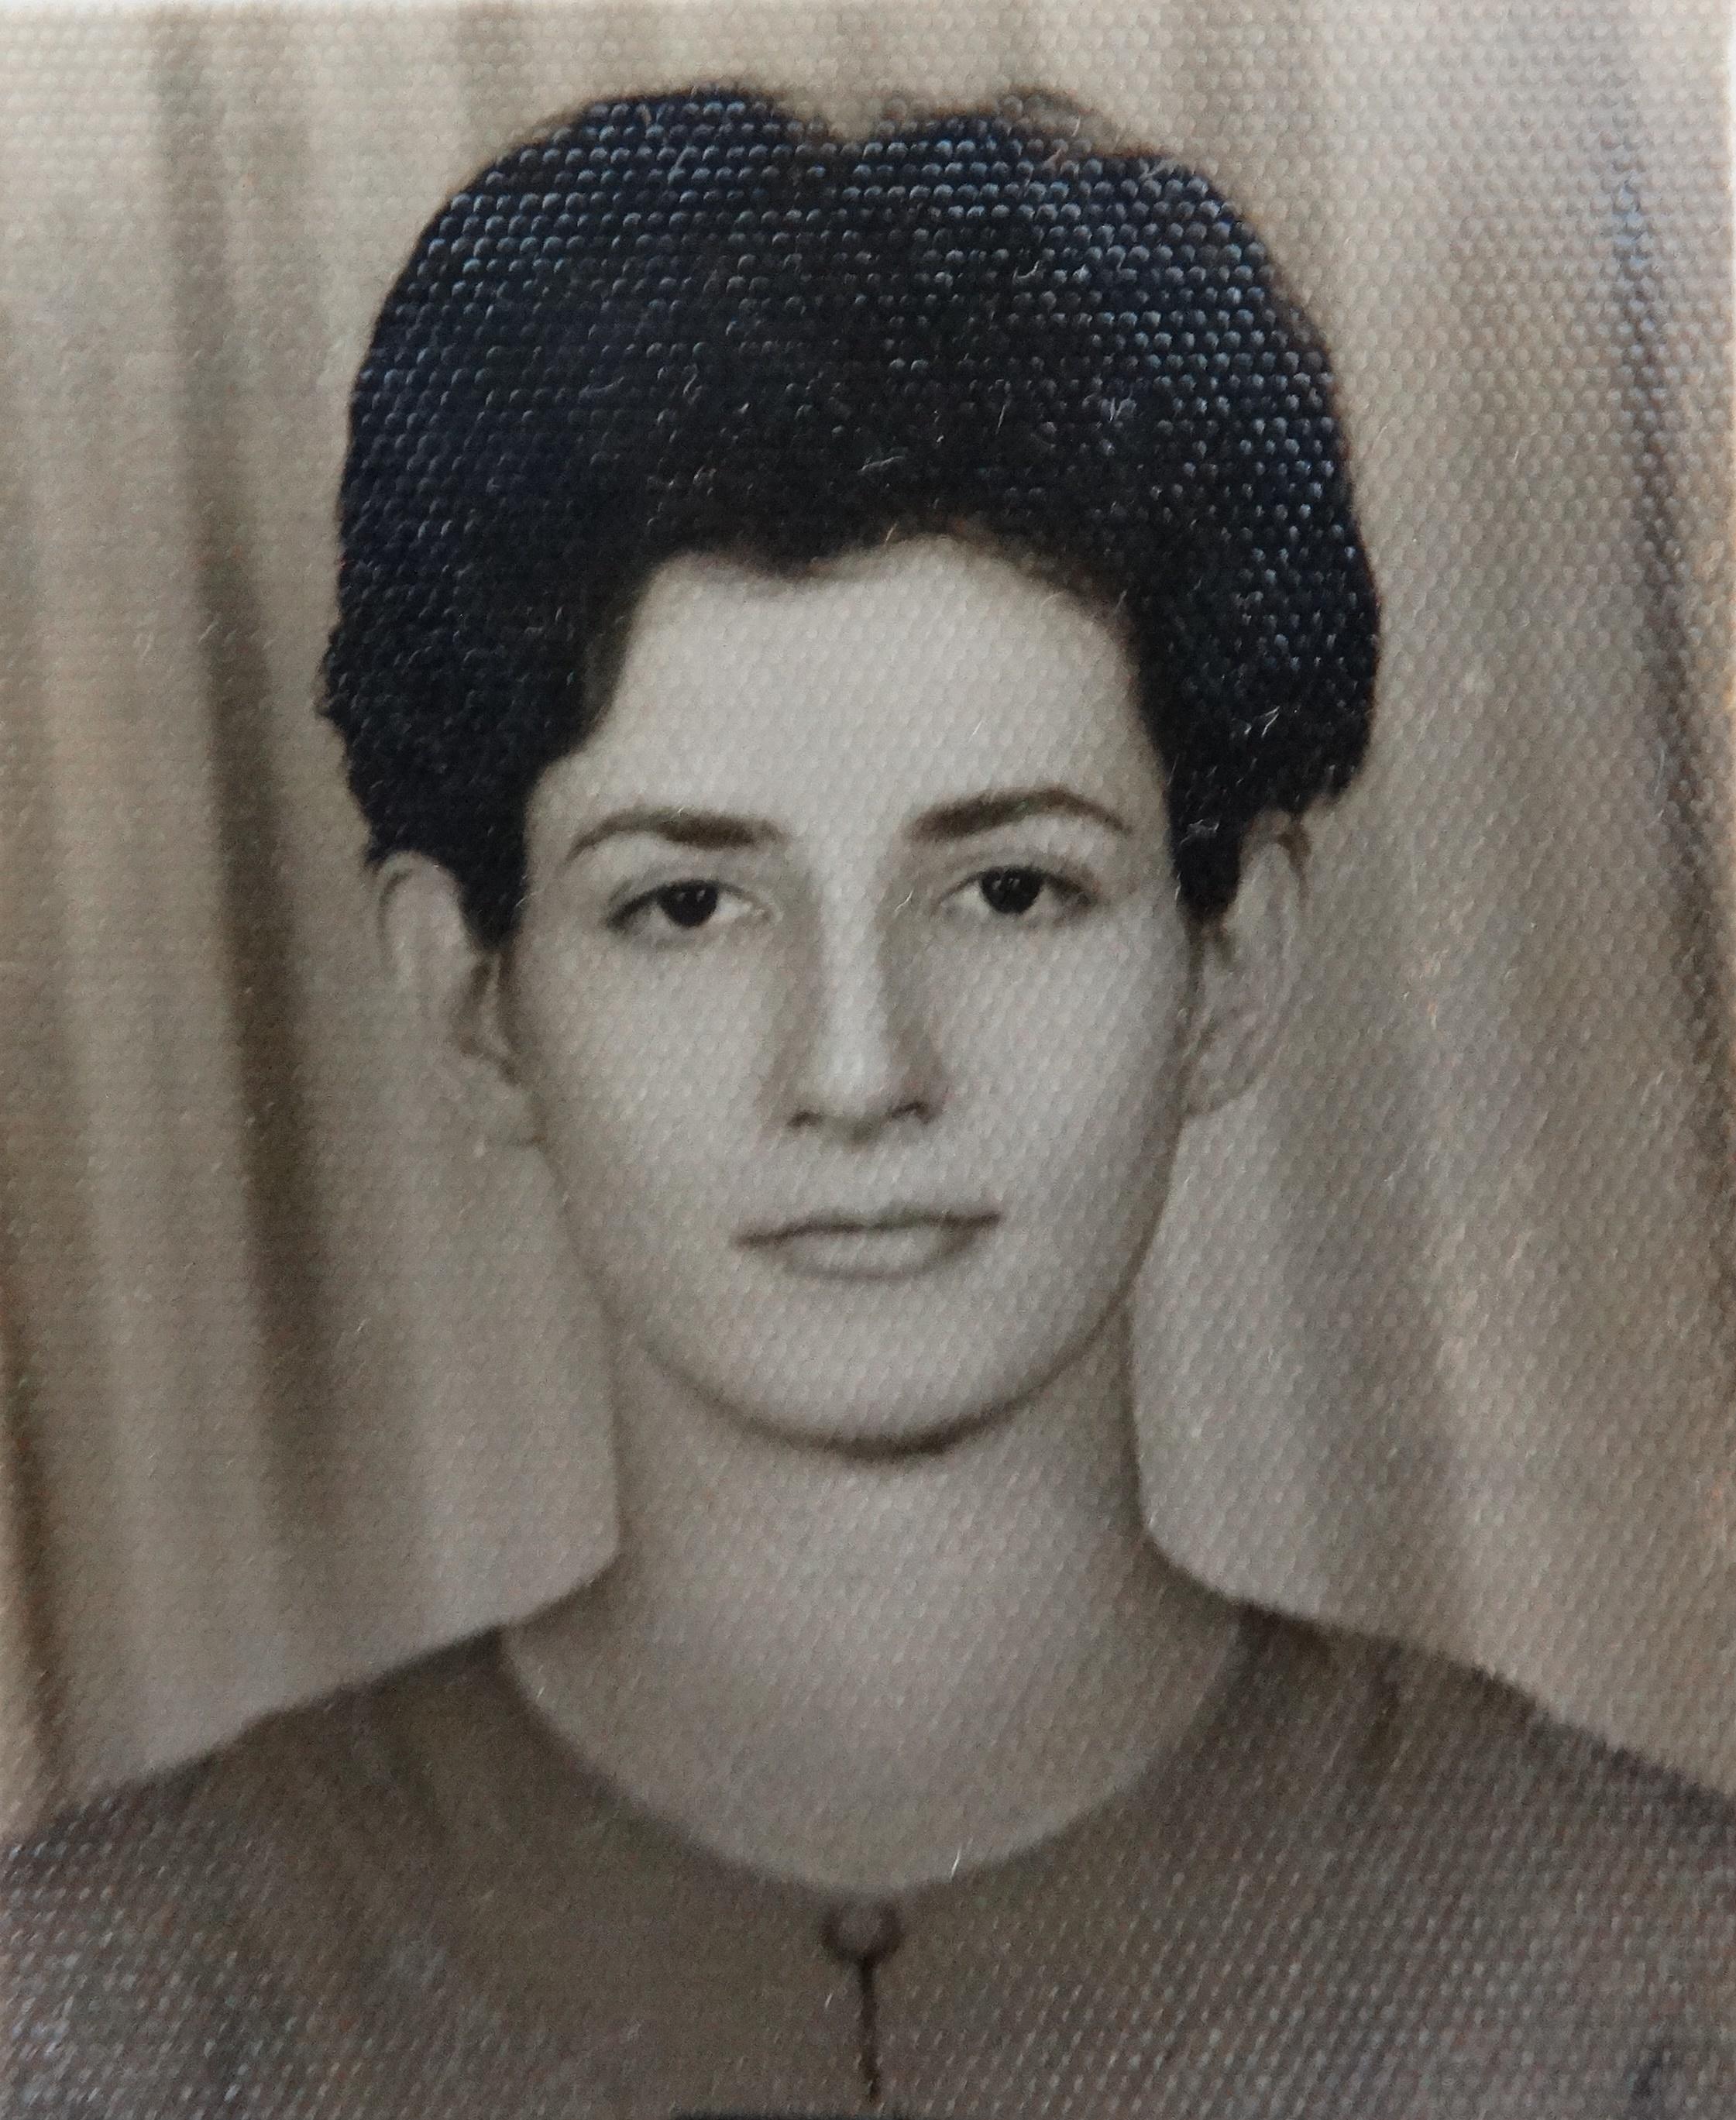 Maria Aparecida de Luca Sousa